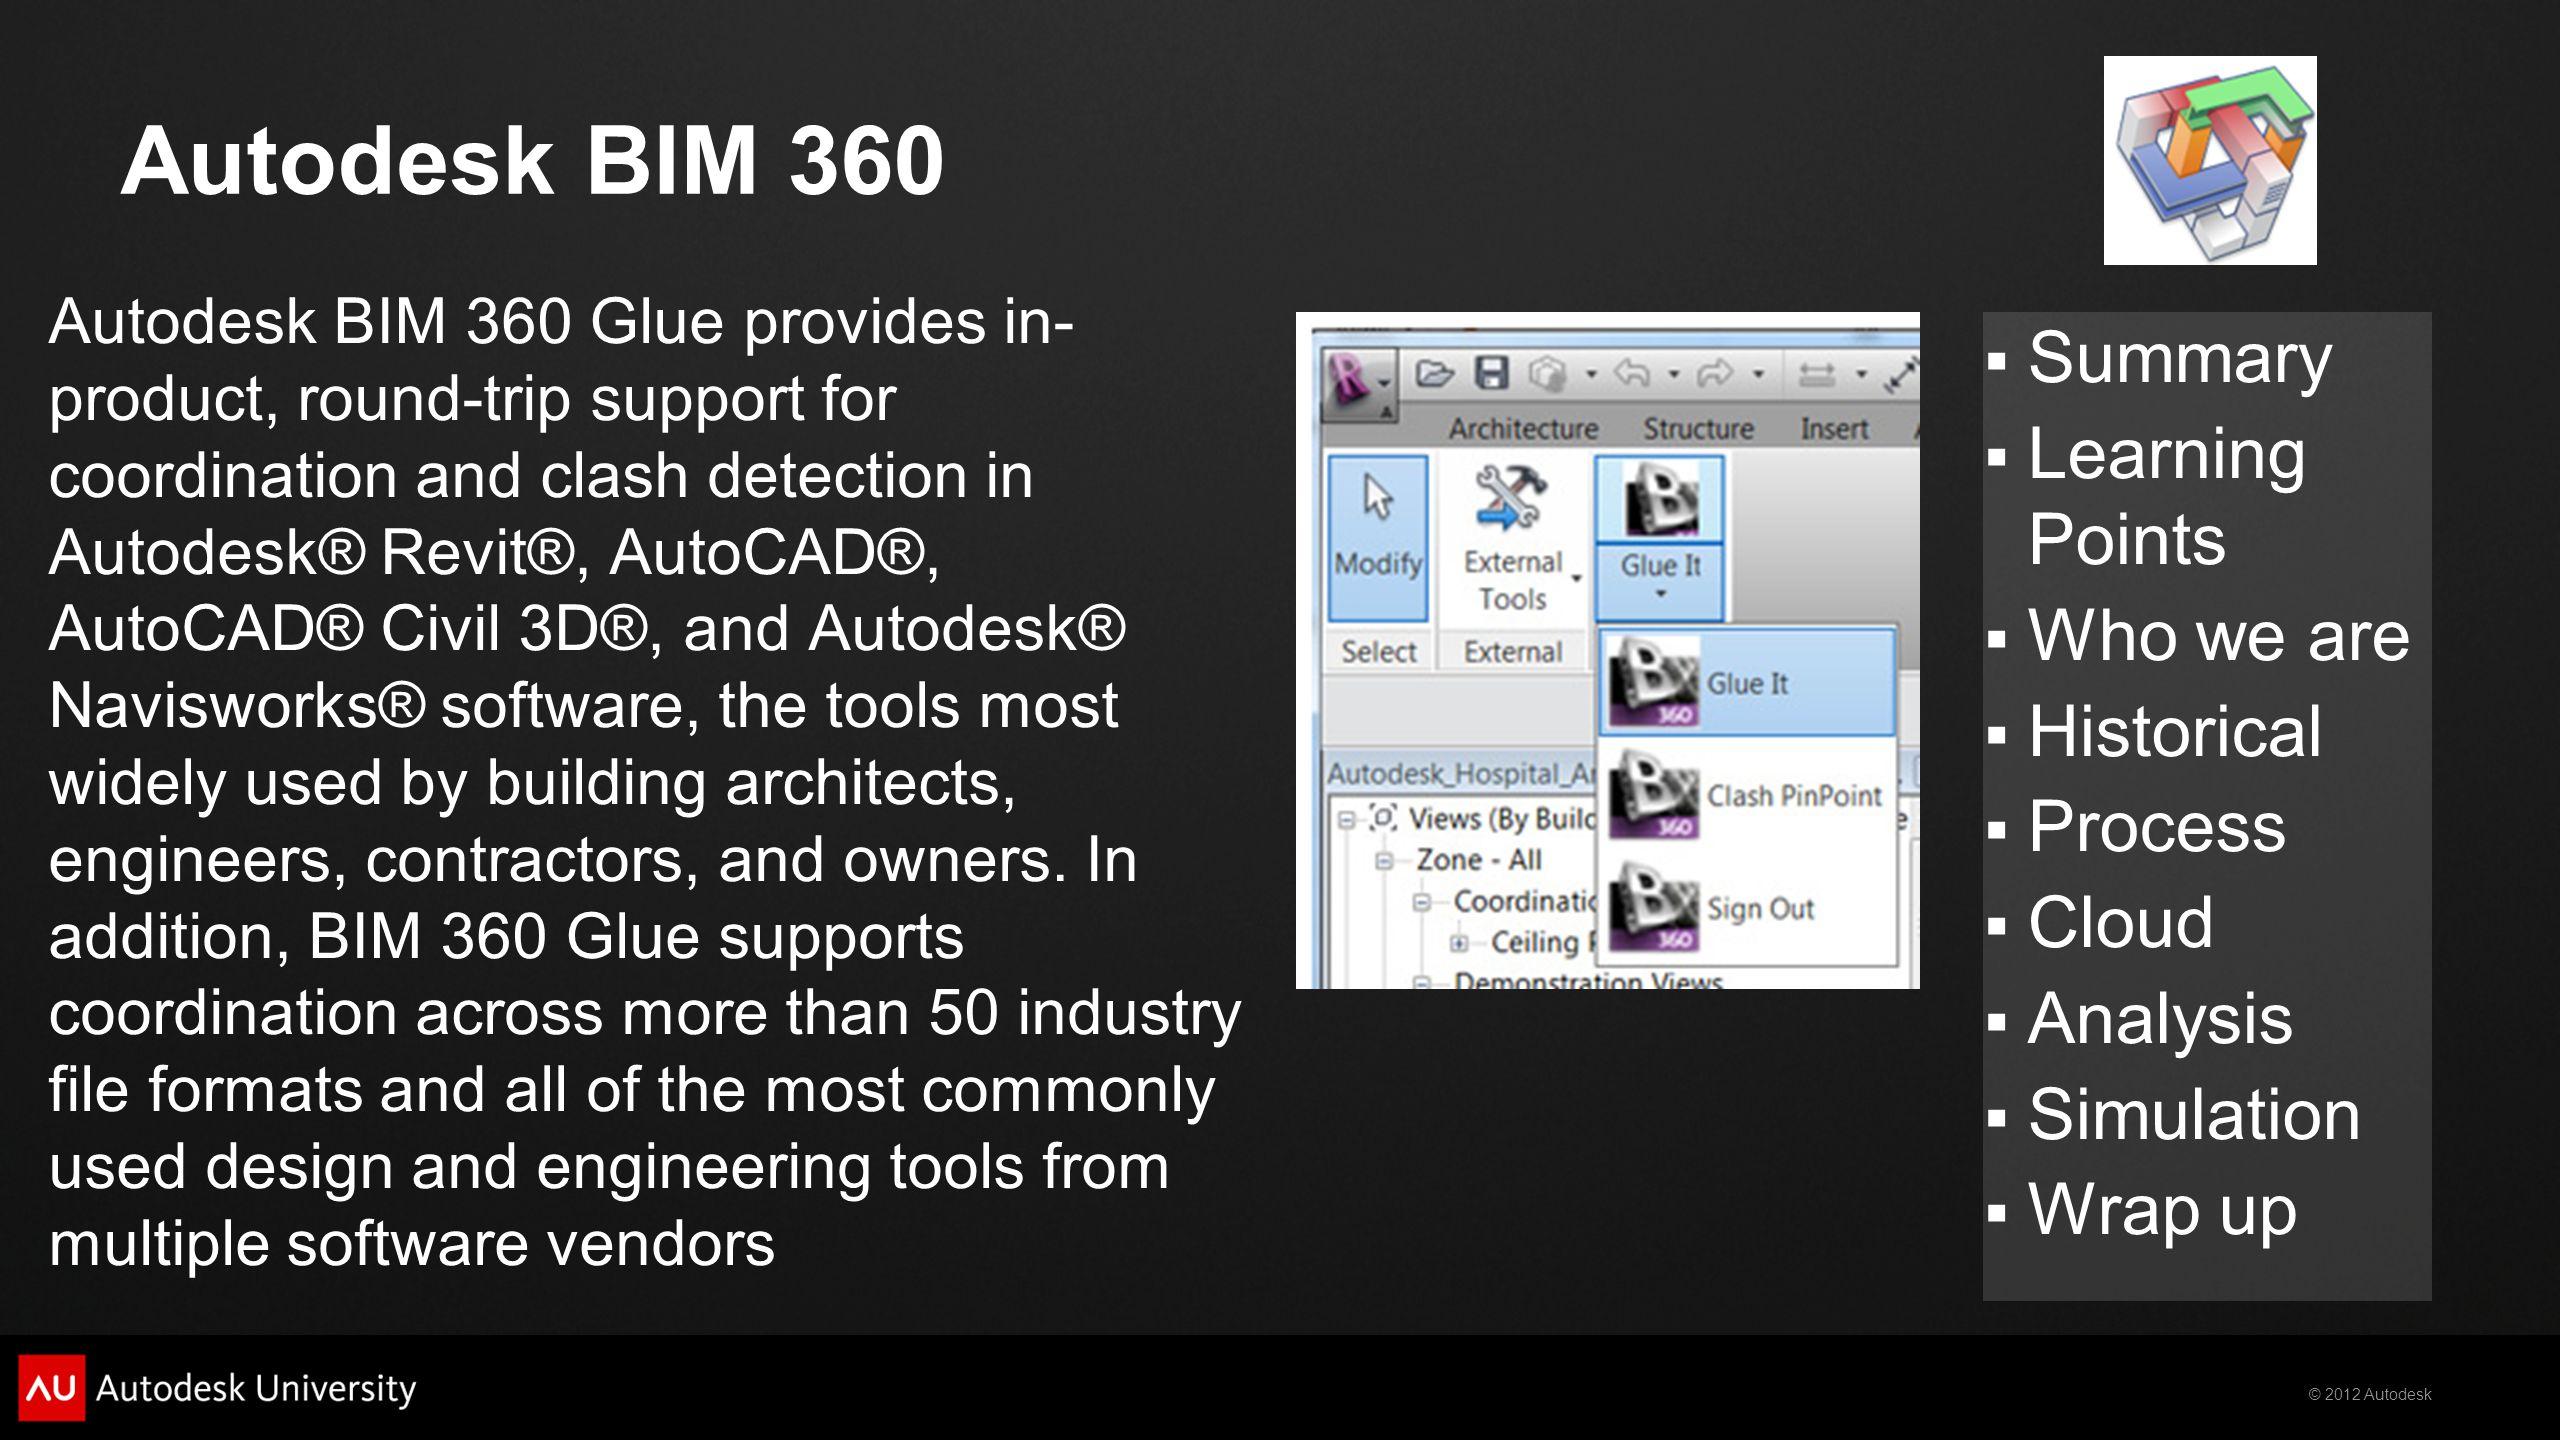 © 2012 Autodesk  Summary  Learning Points  Who we are  Historical  Process  Cloud  Analysis  Simulation  Wrap up Autodesk BIM 360 Autodesk BI